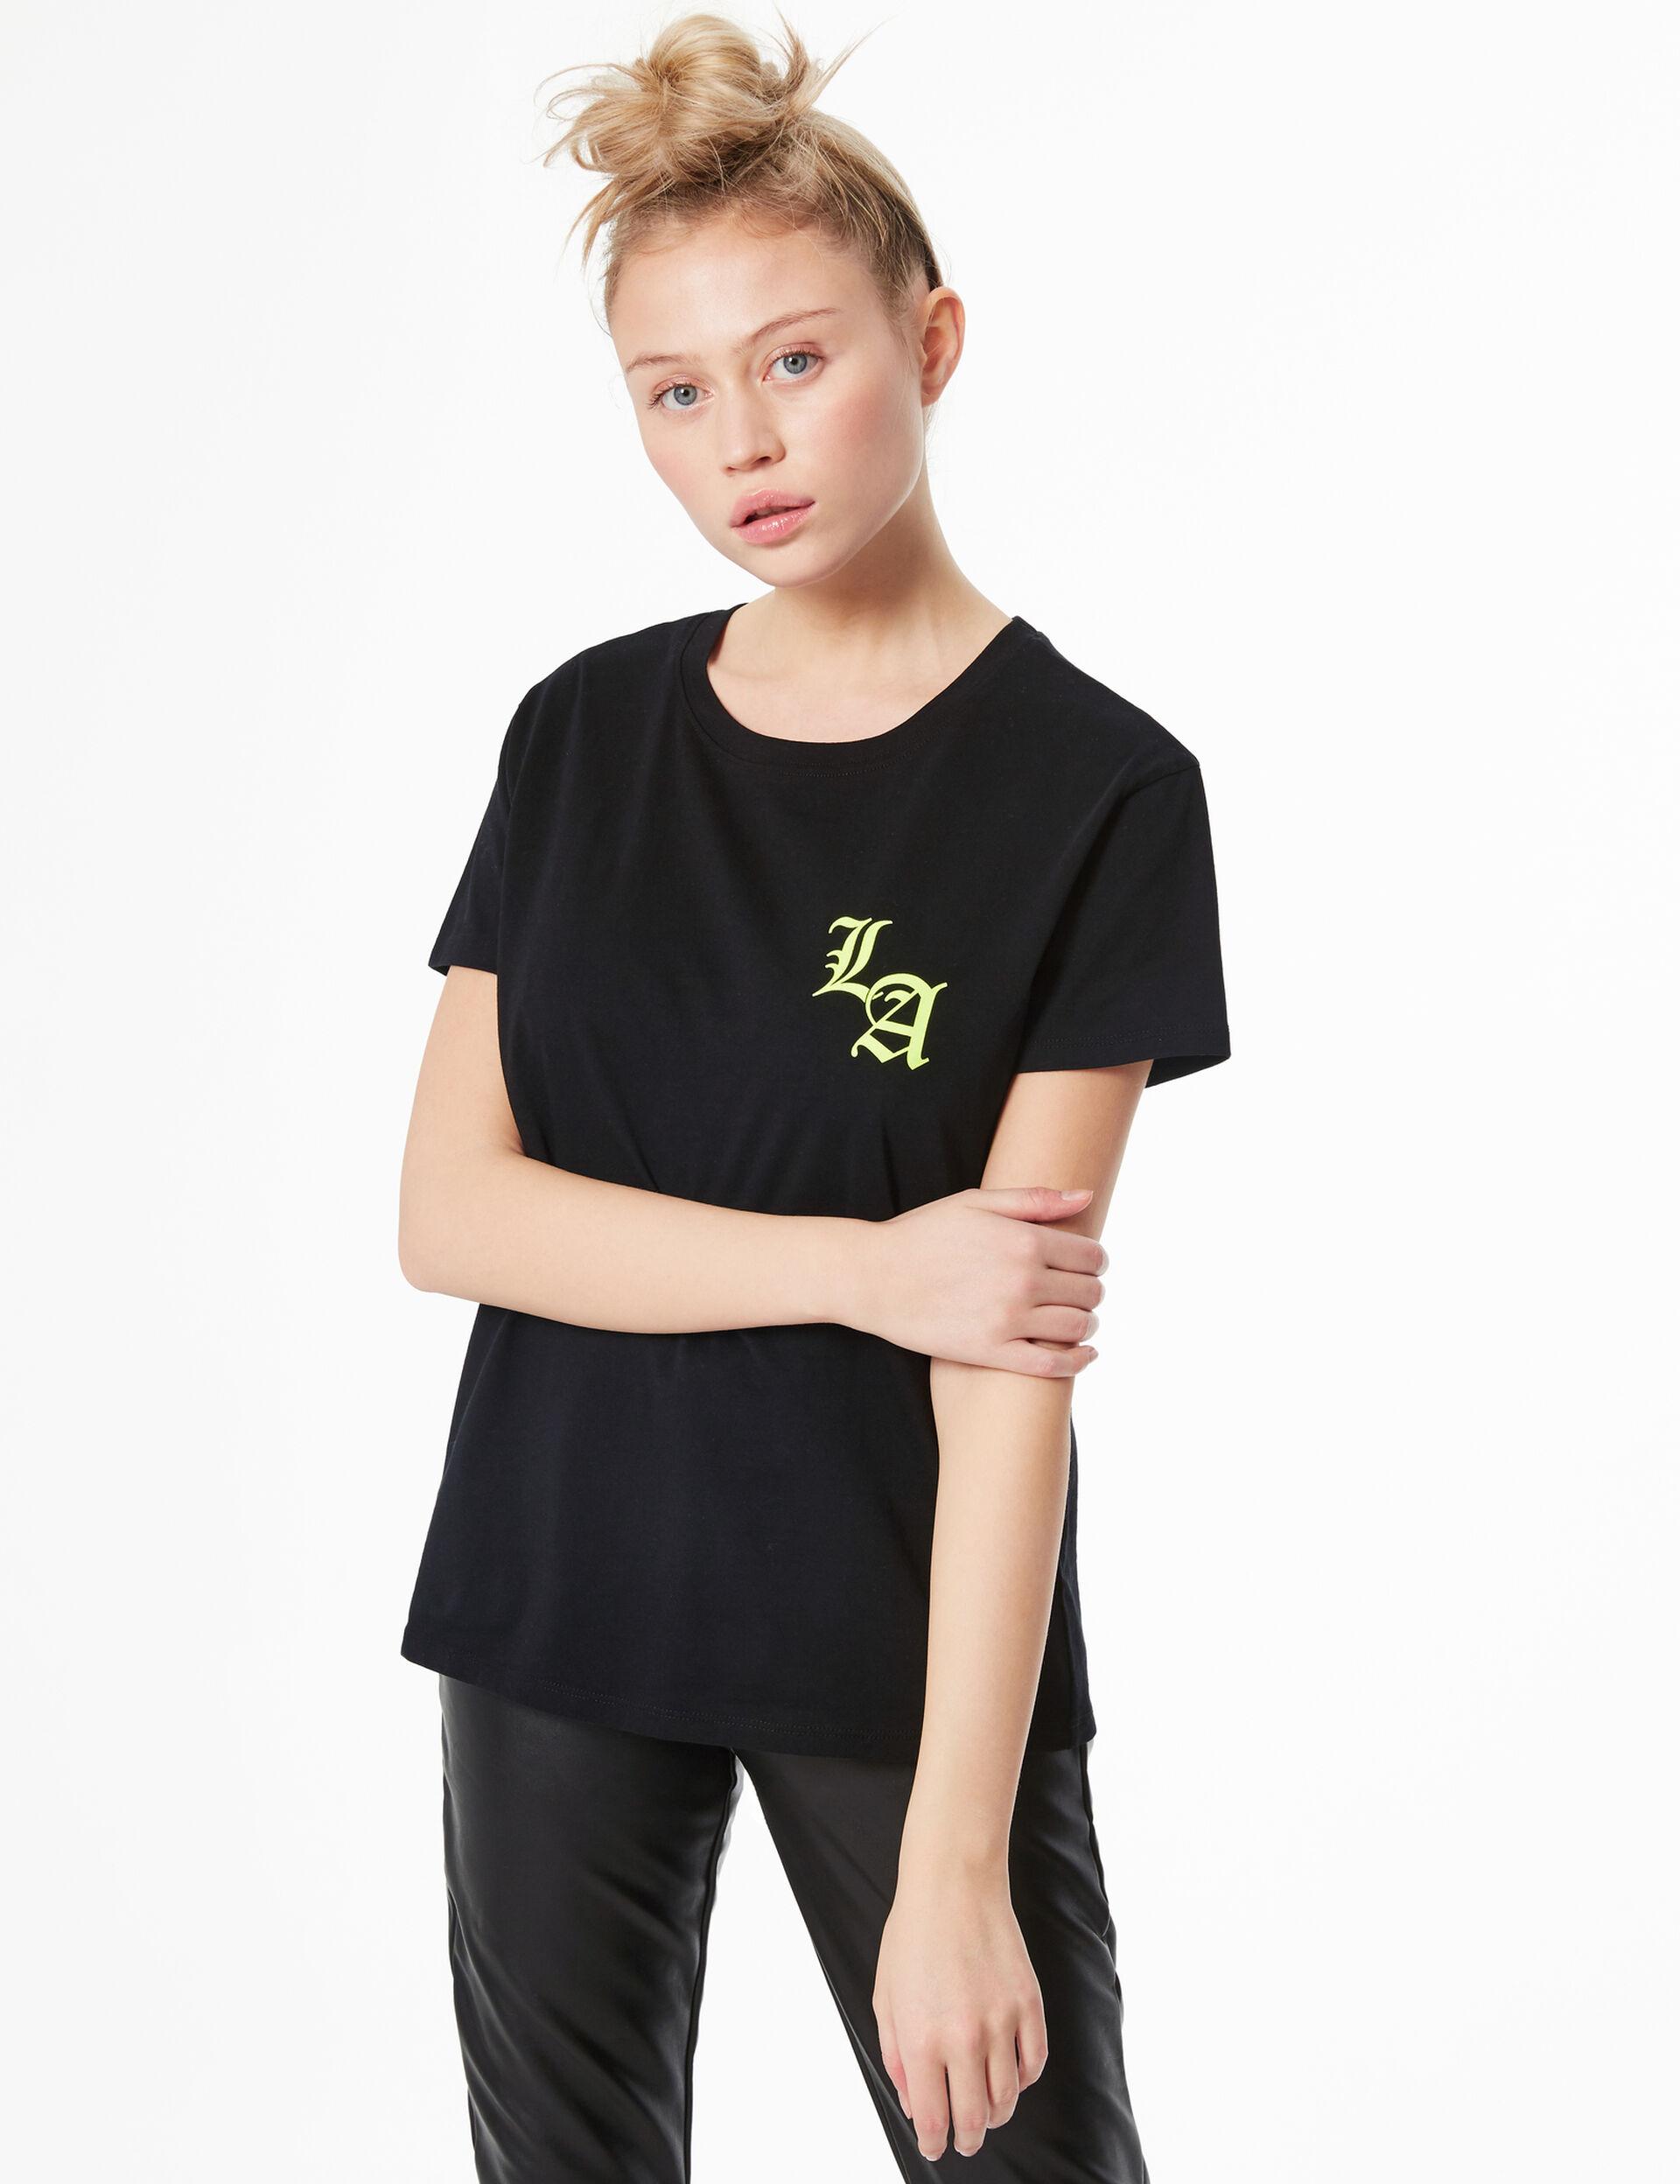 'Los Angeles' T-shirt